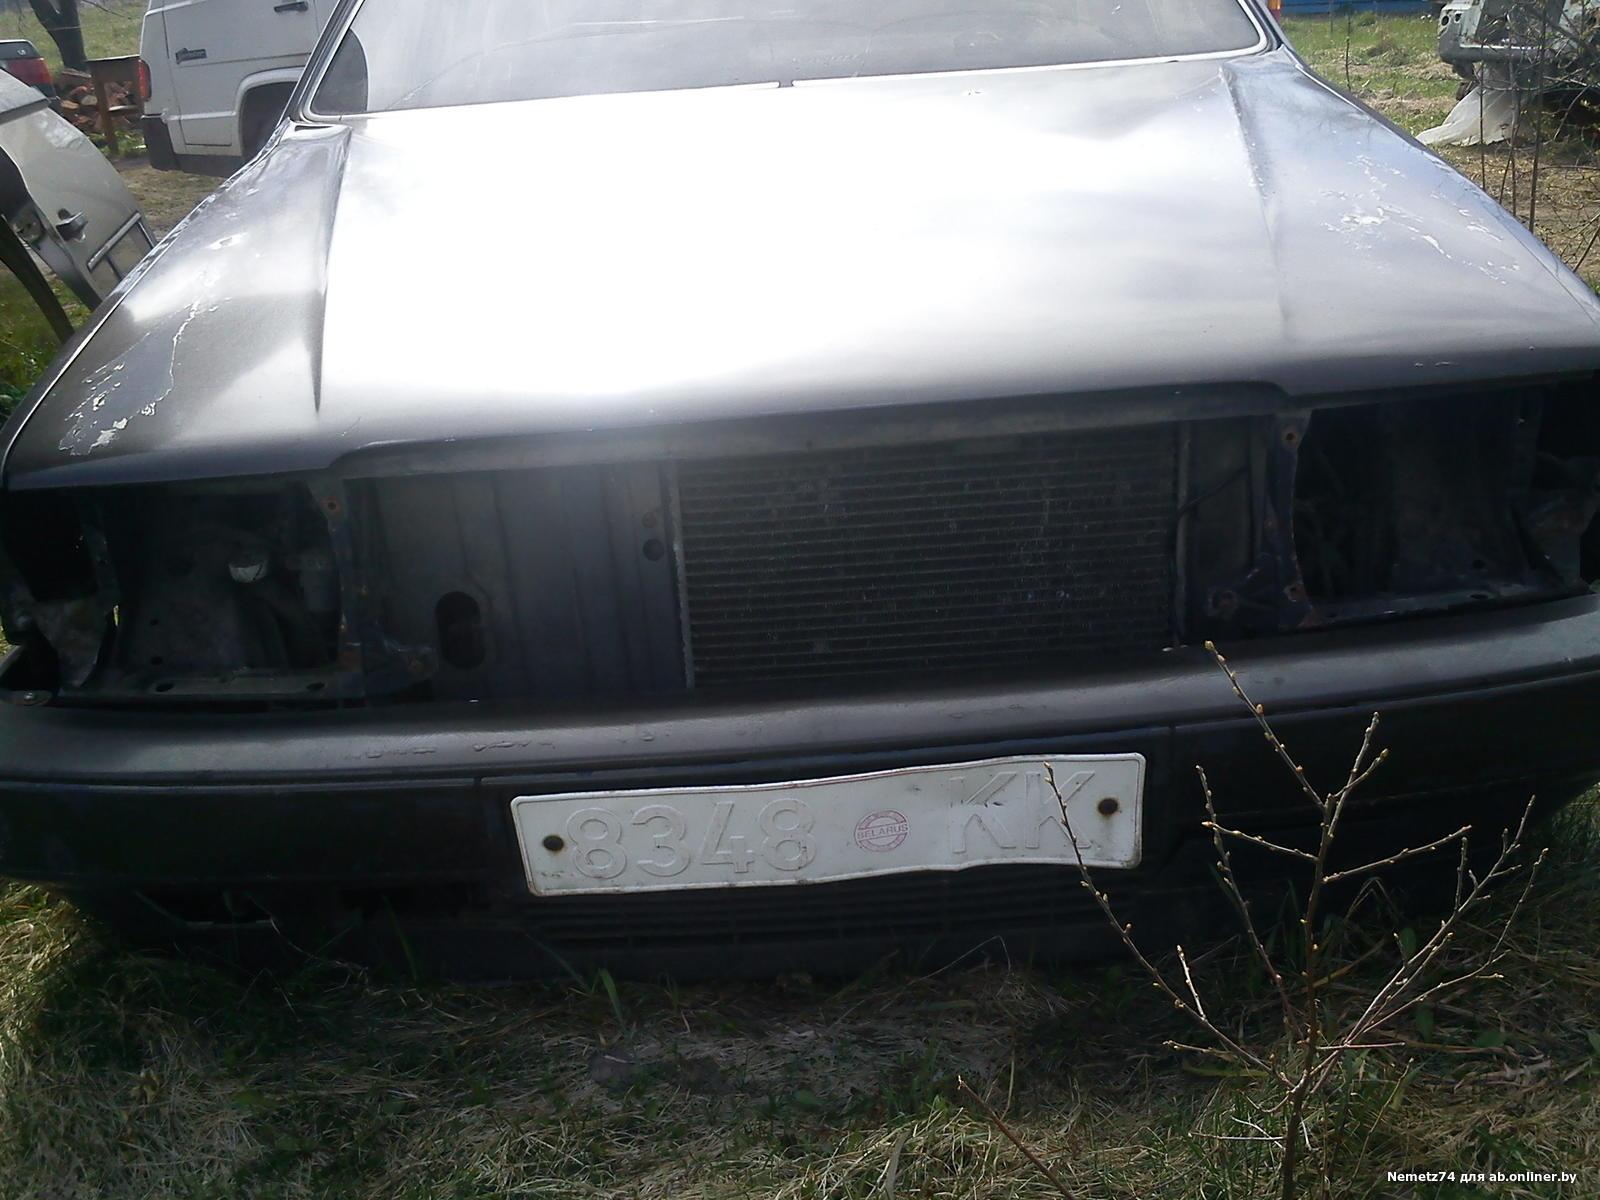 Lancia Thema V6